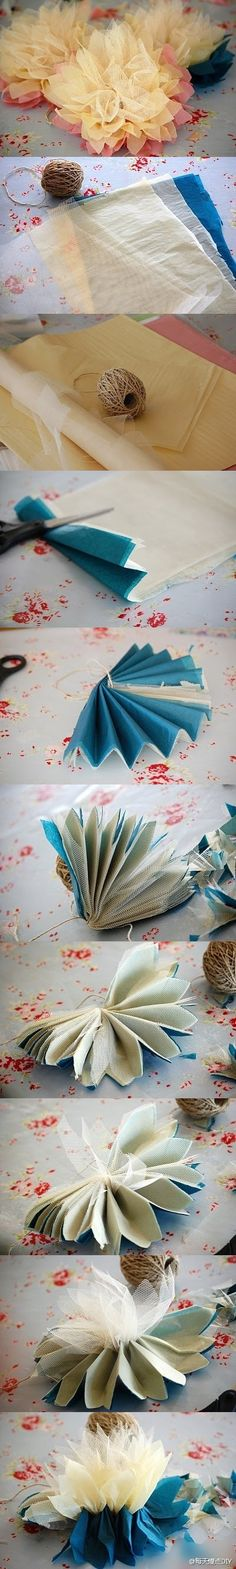 fabric flowers, I like the concept